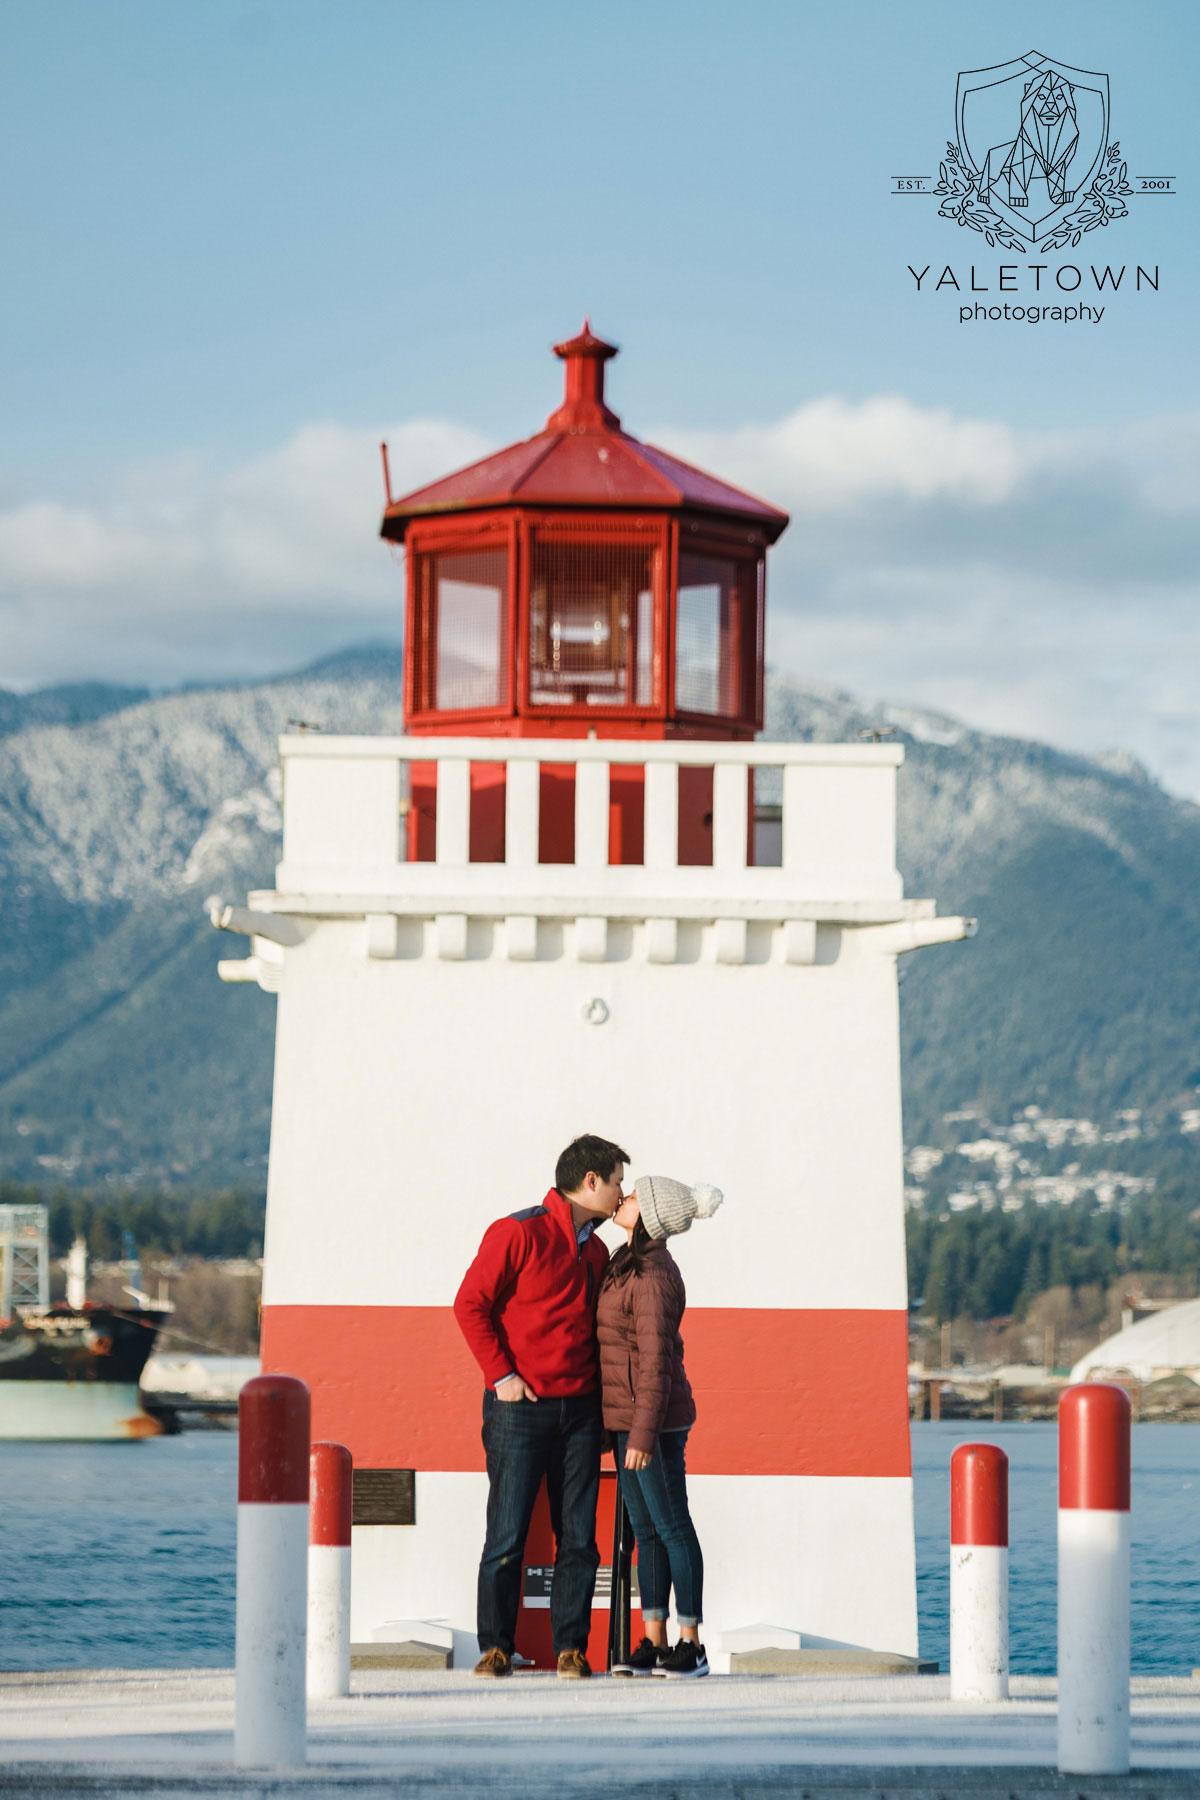 Wedding-Proposal-Vancouver-Stanley-Park-Wedding-Photographer-Vancouver-Yaletown-Photography-Photo-19.JPG